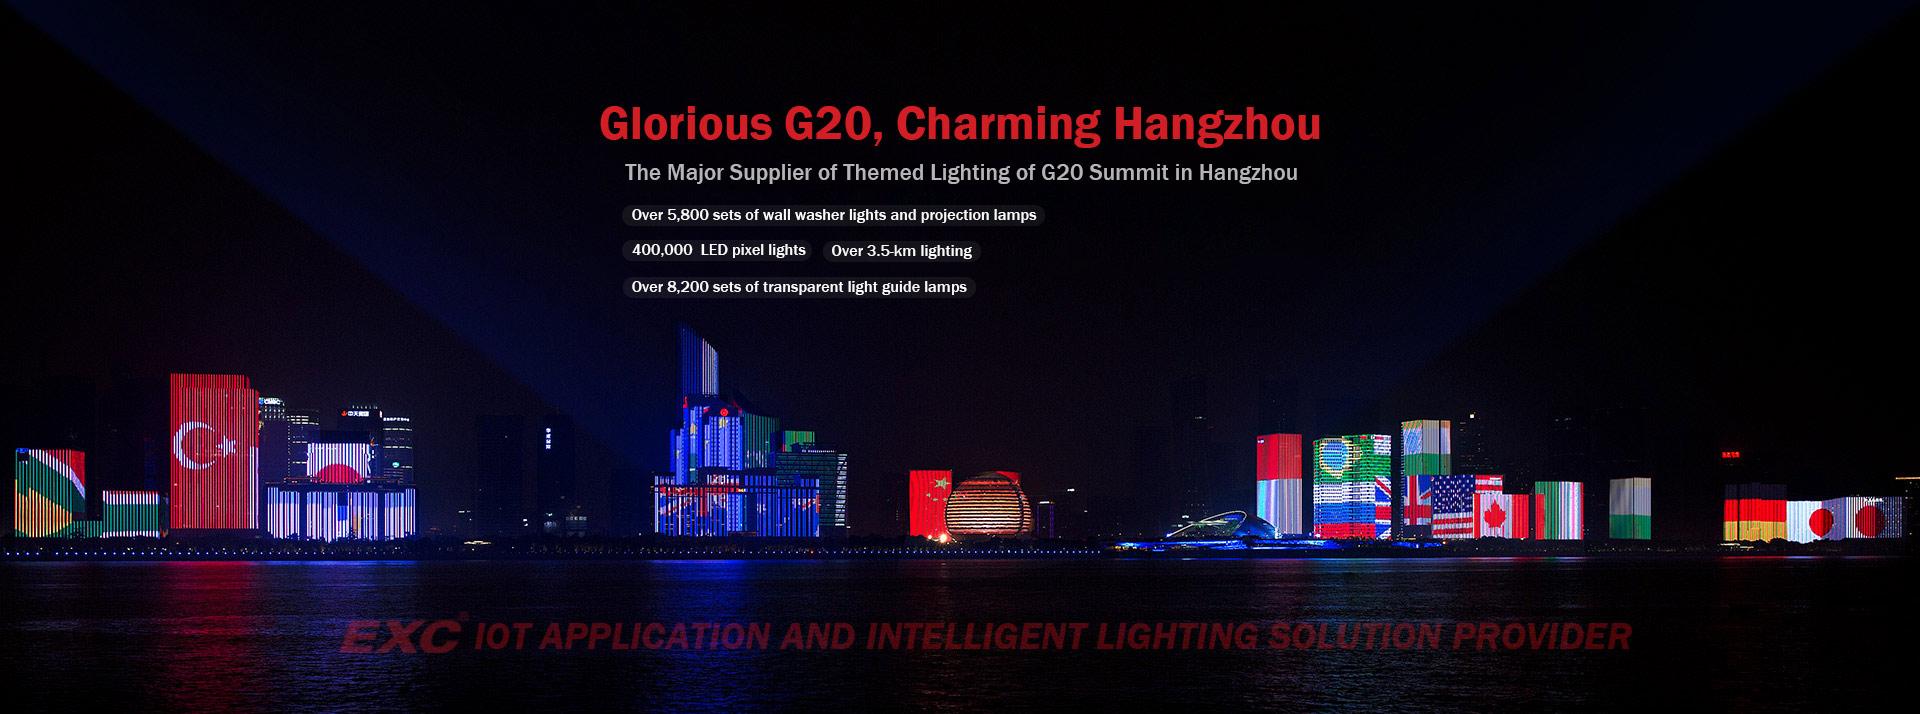 G20-SUMMIT-IN-HANGZHOU.jpg